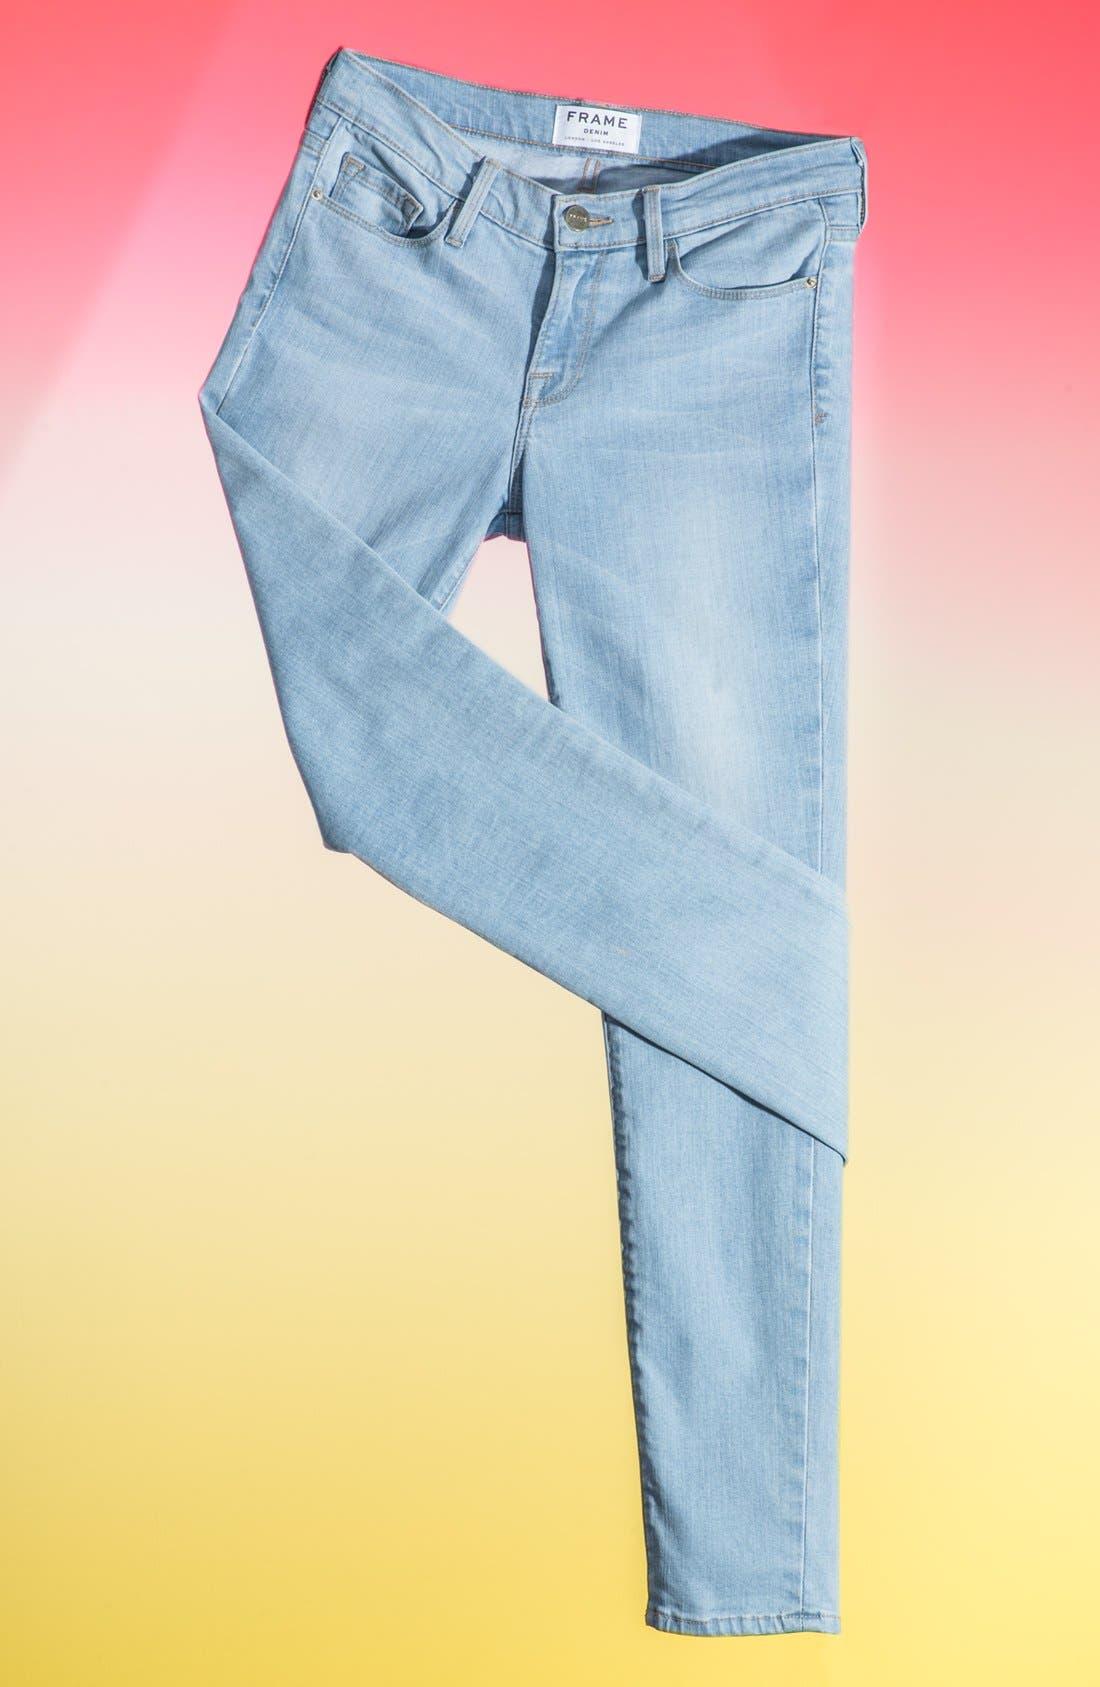 Main Image - Frame Denim 'Le Skinny de Jeanne' Jeans (Redchurch Street)